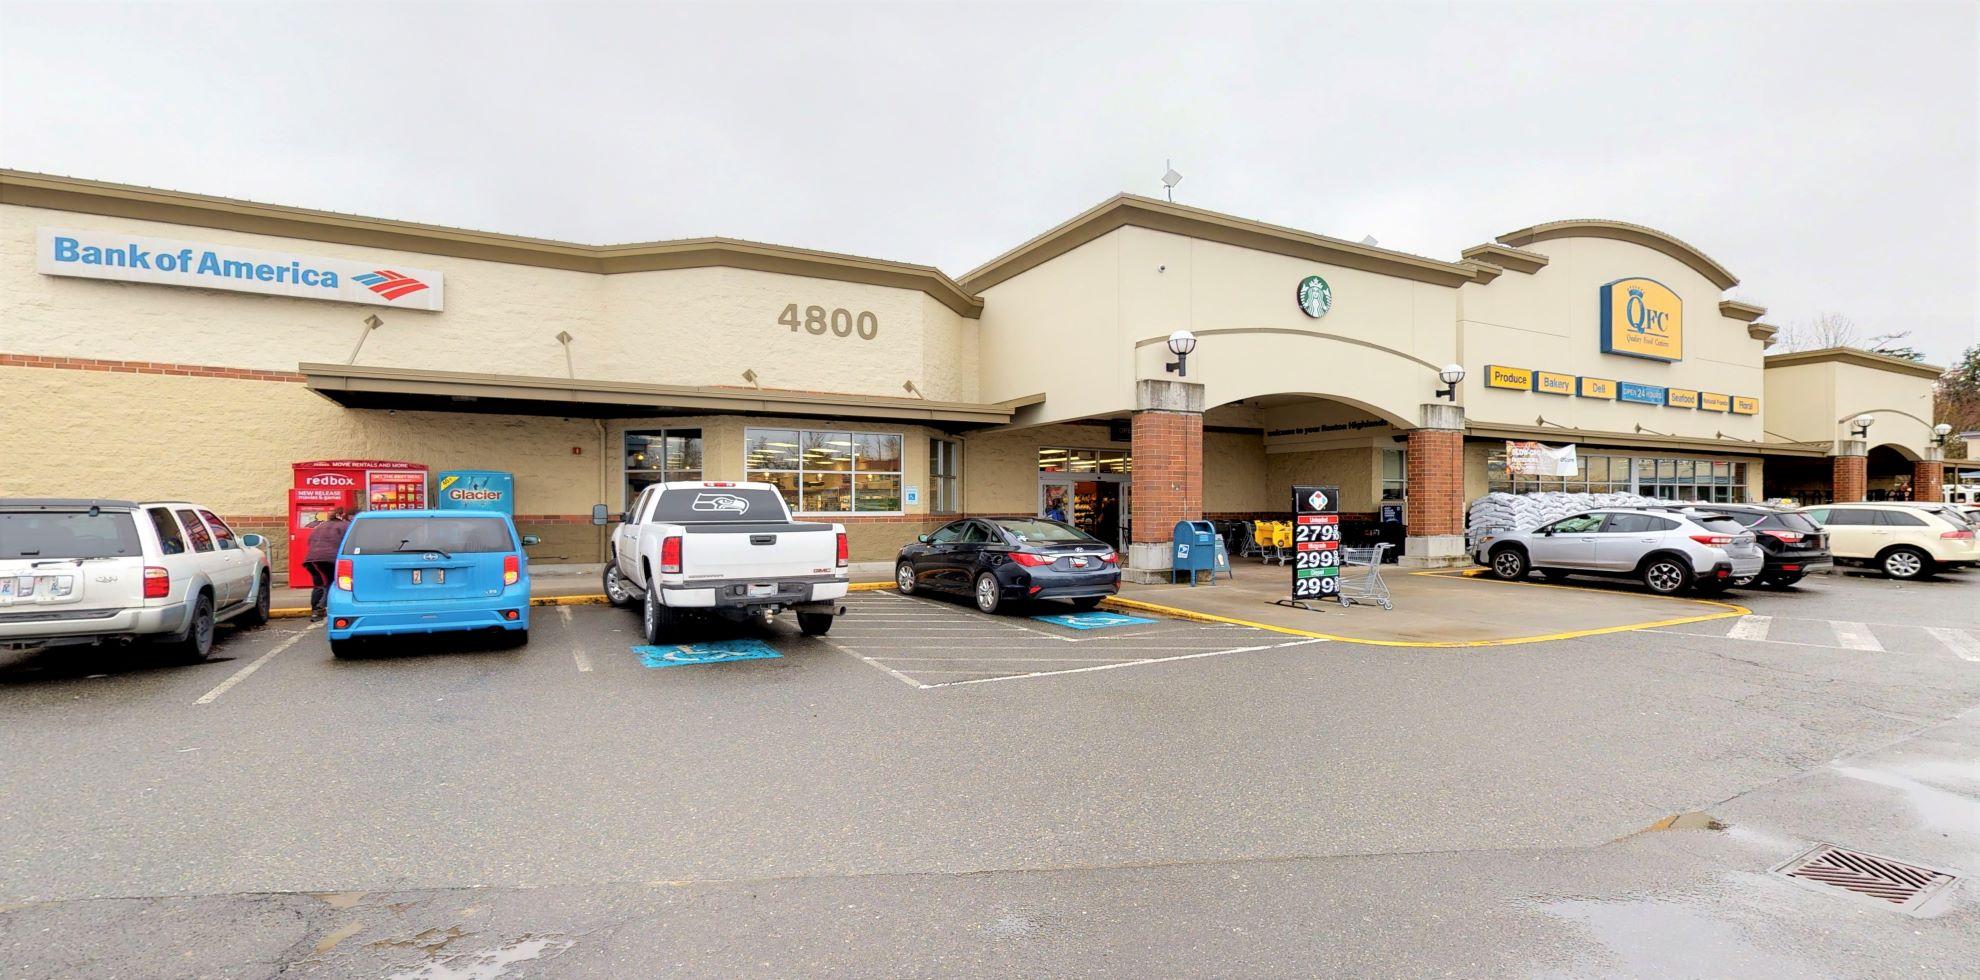 Bank of America financial center with walk-up ATM   4800 NE 4th St, Renton, WA 98059